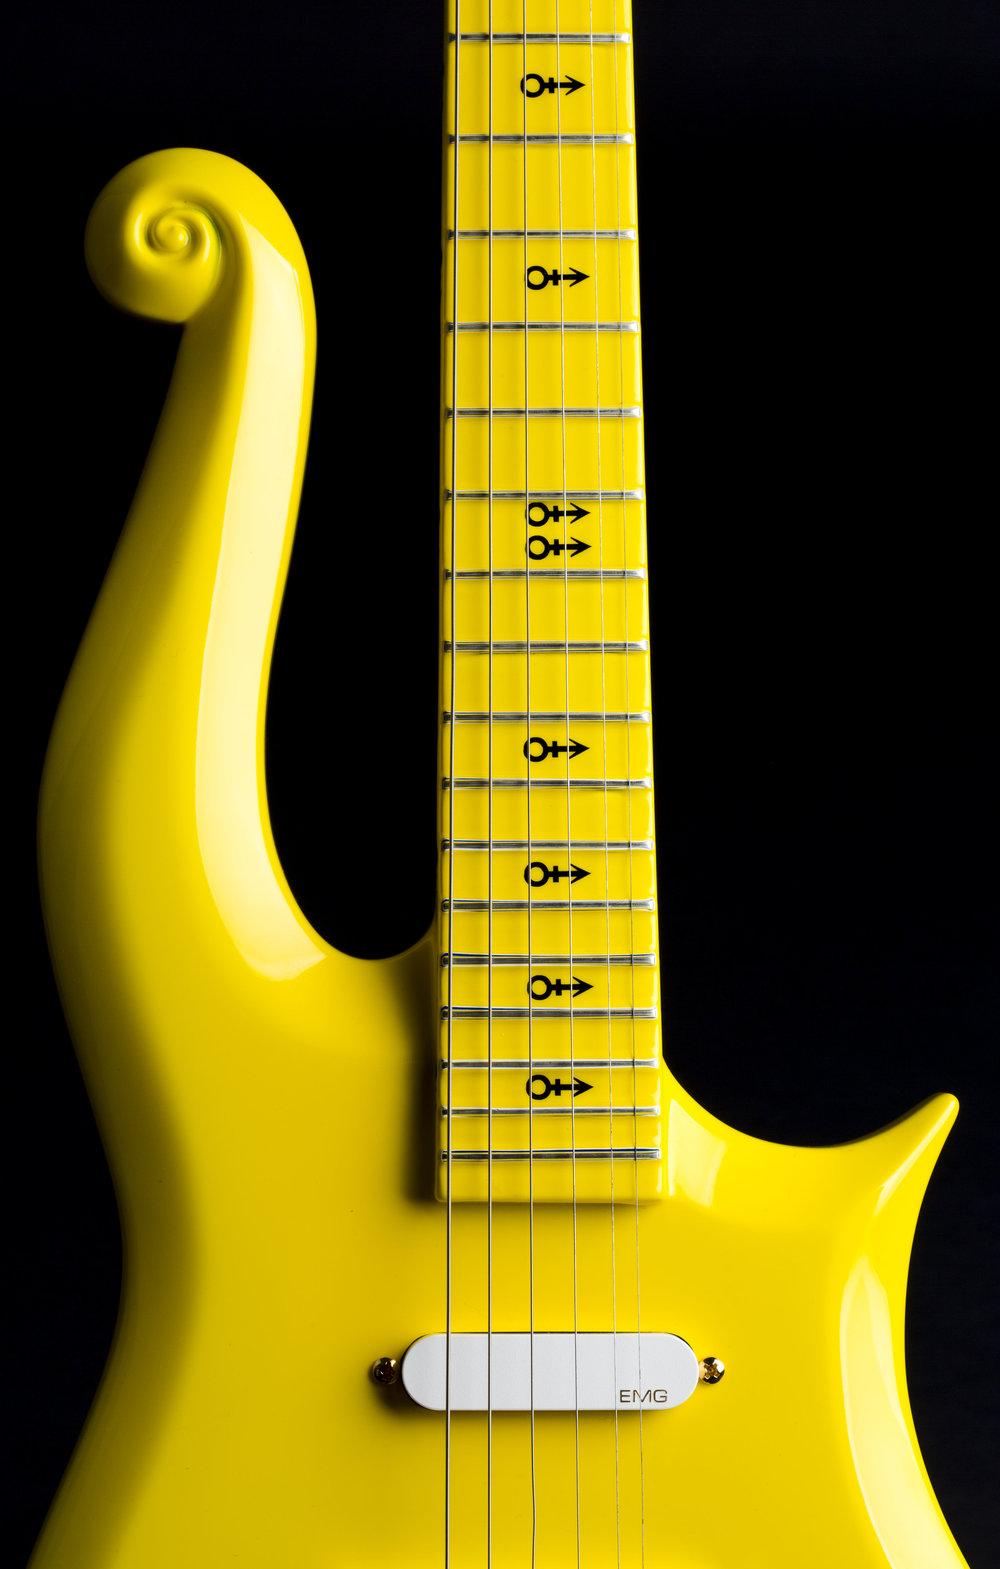 Prince_Cloud Yellow Guitar_HRC081434-31.JPG